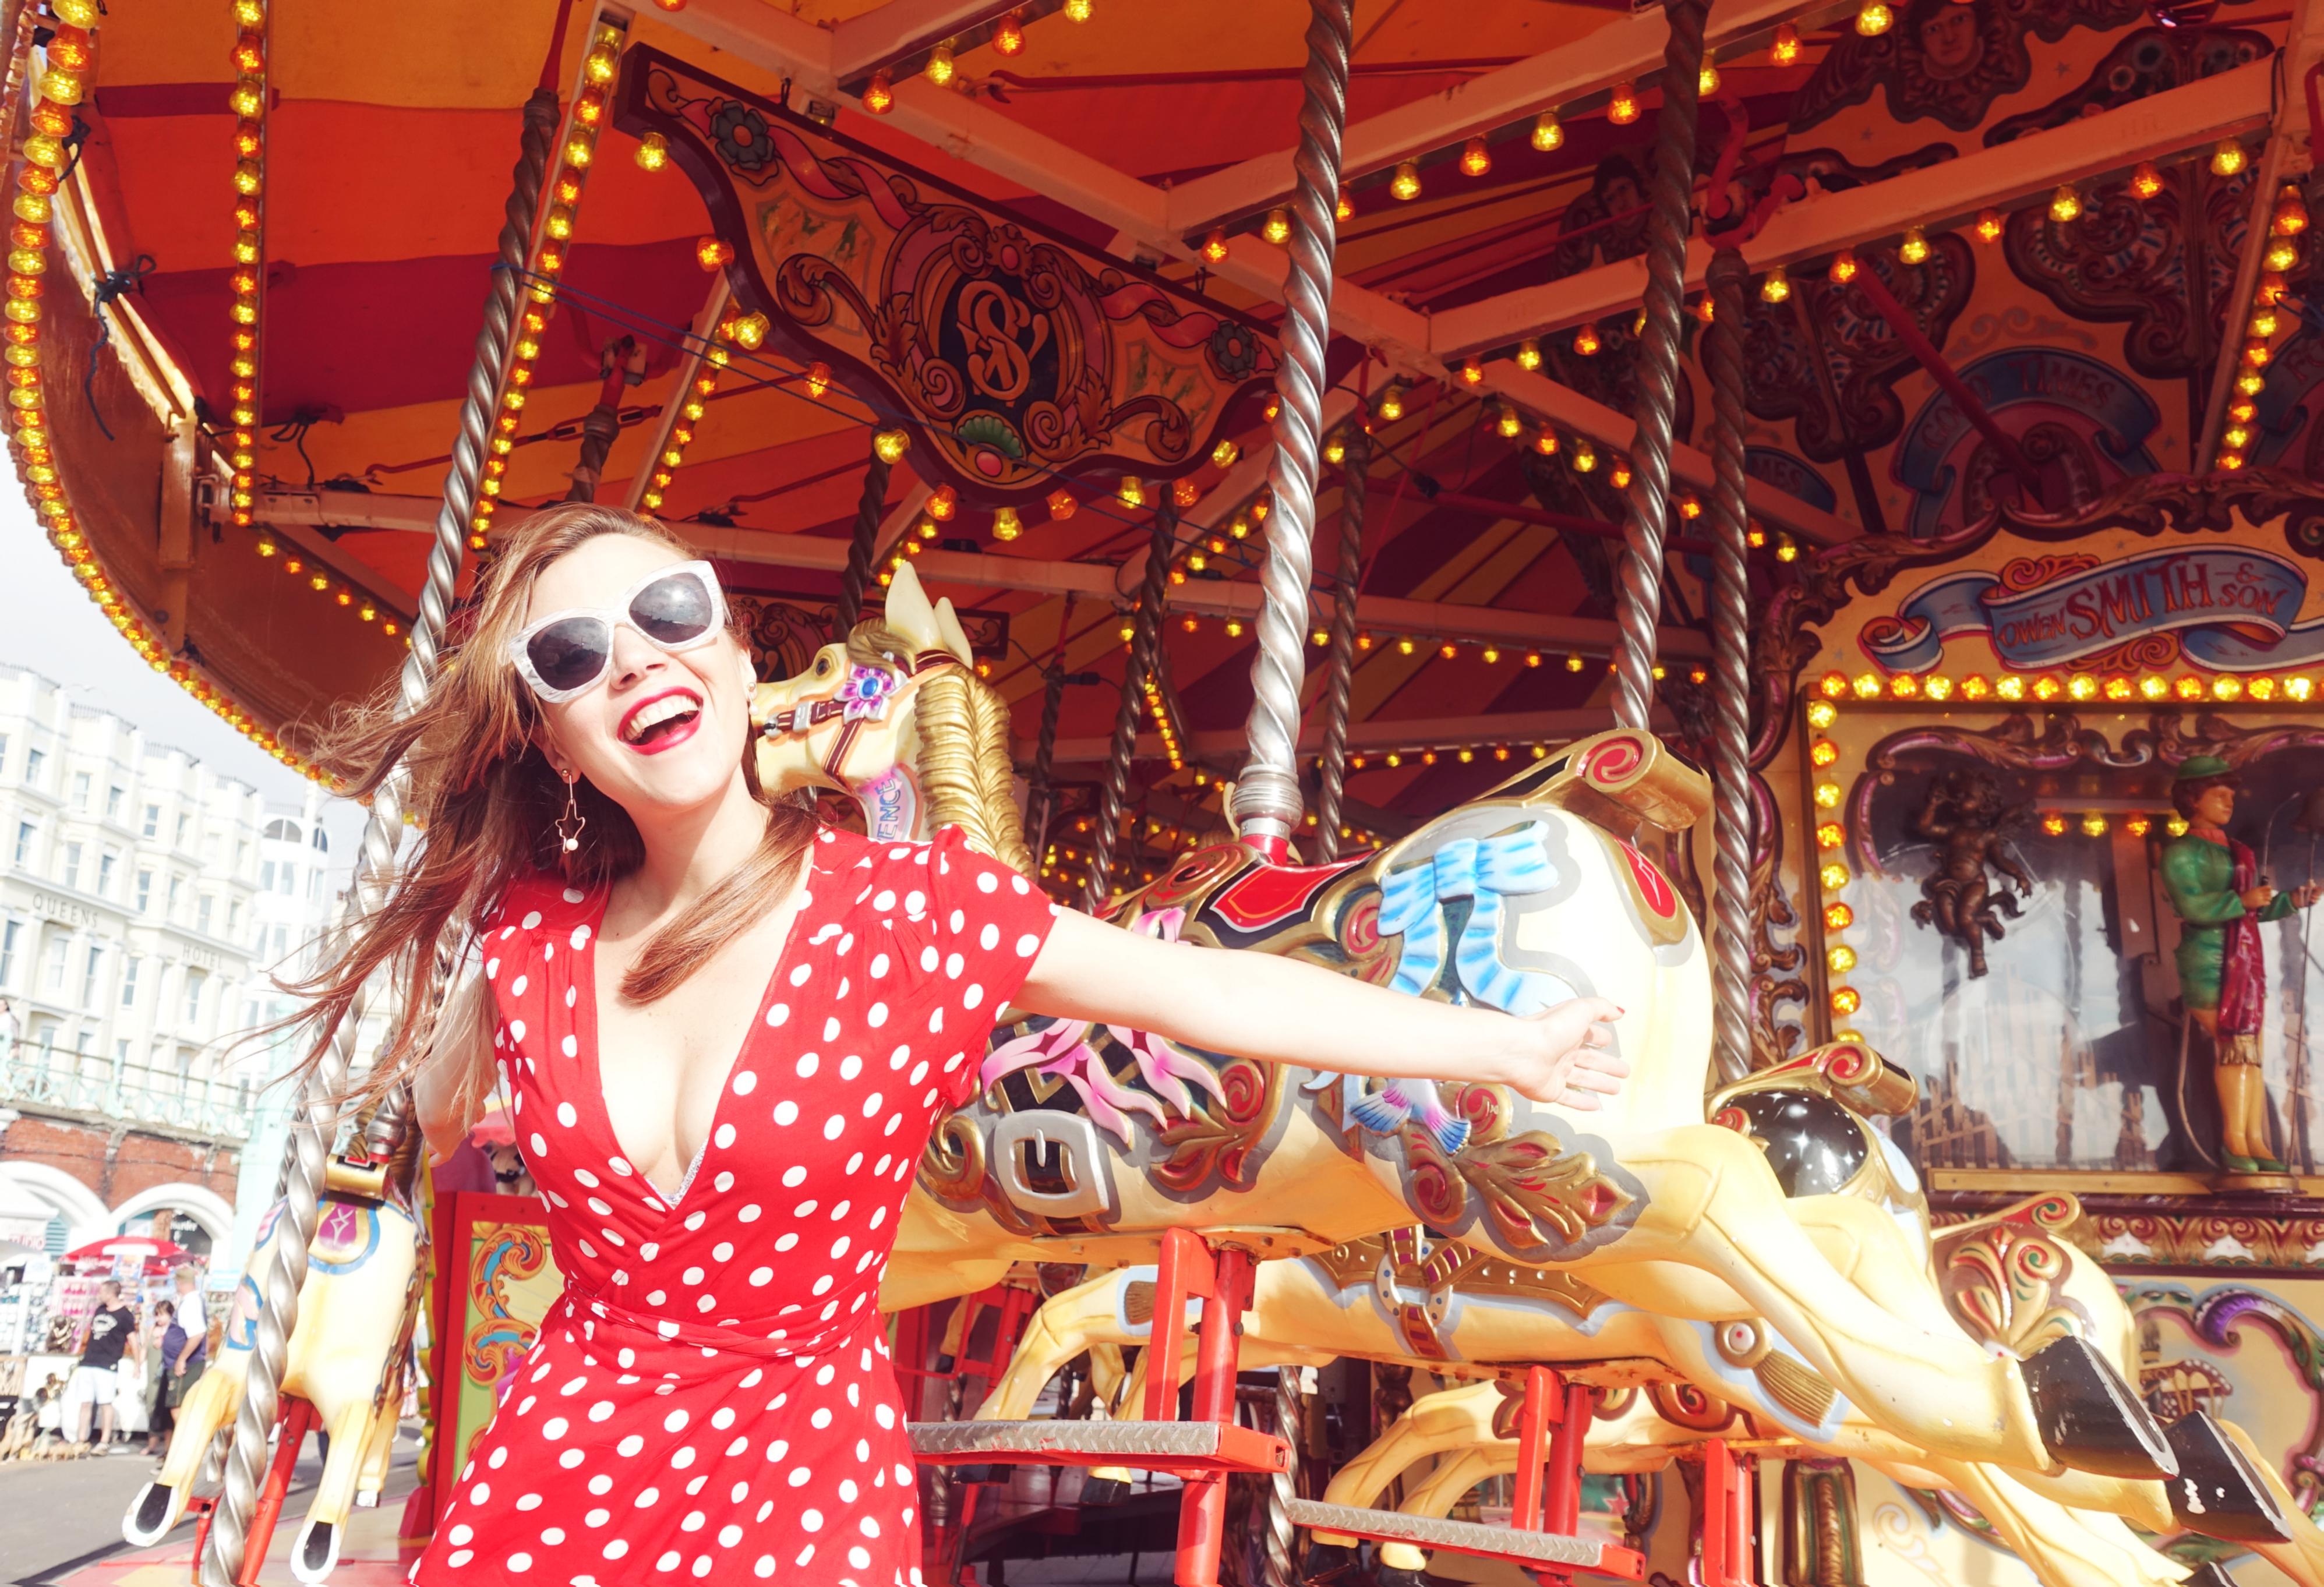 Blog-de-viajes-PiensaenChic-Influencer-ChicAdicta-fashionista-travel-style-Brighton-floryday-dress-blog-e-moda-Chic-adicta-Piensa-en-Chic